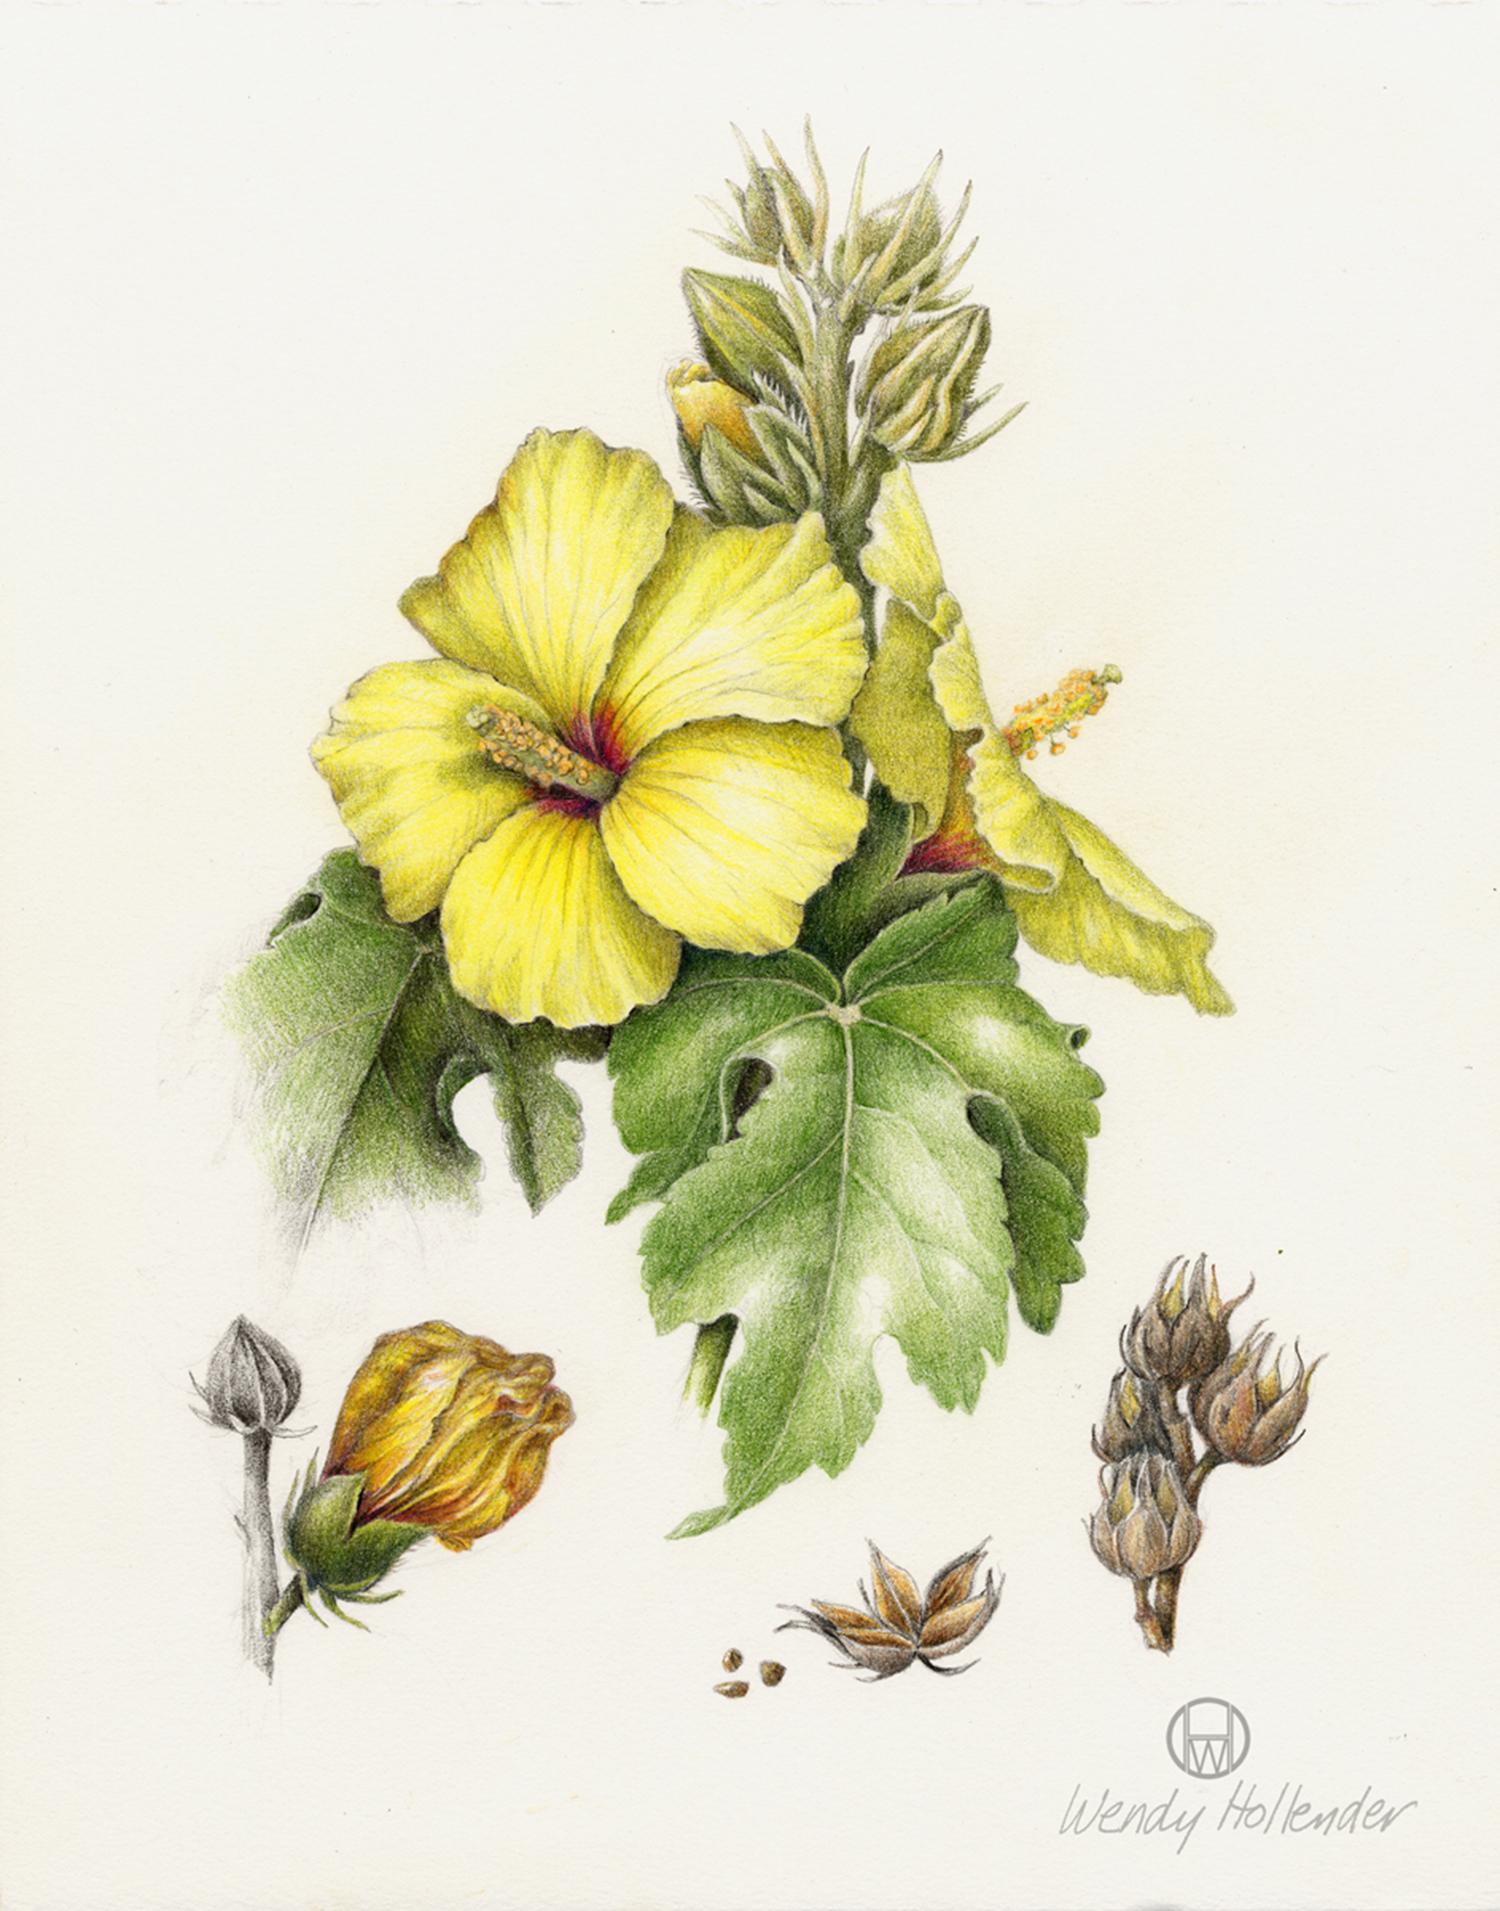 Hibiscus Ma'o hau hele - Hibiscus breckenridgei